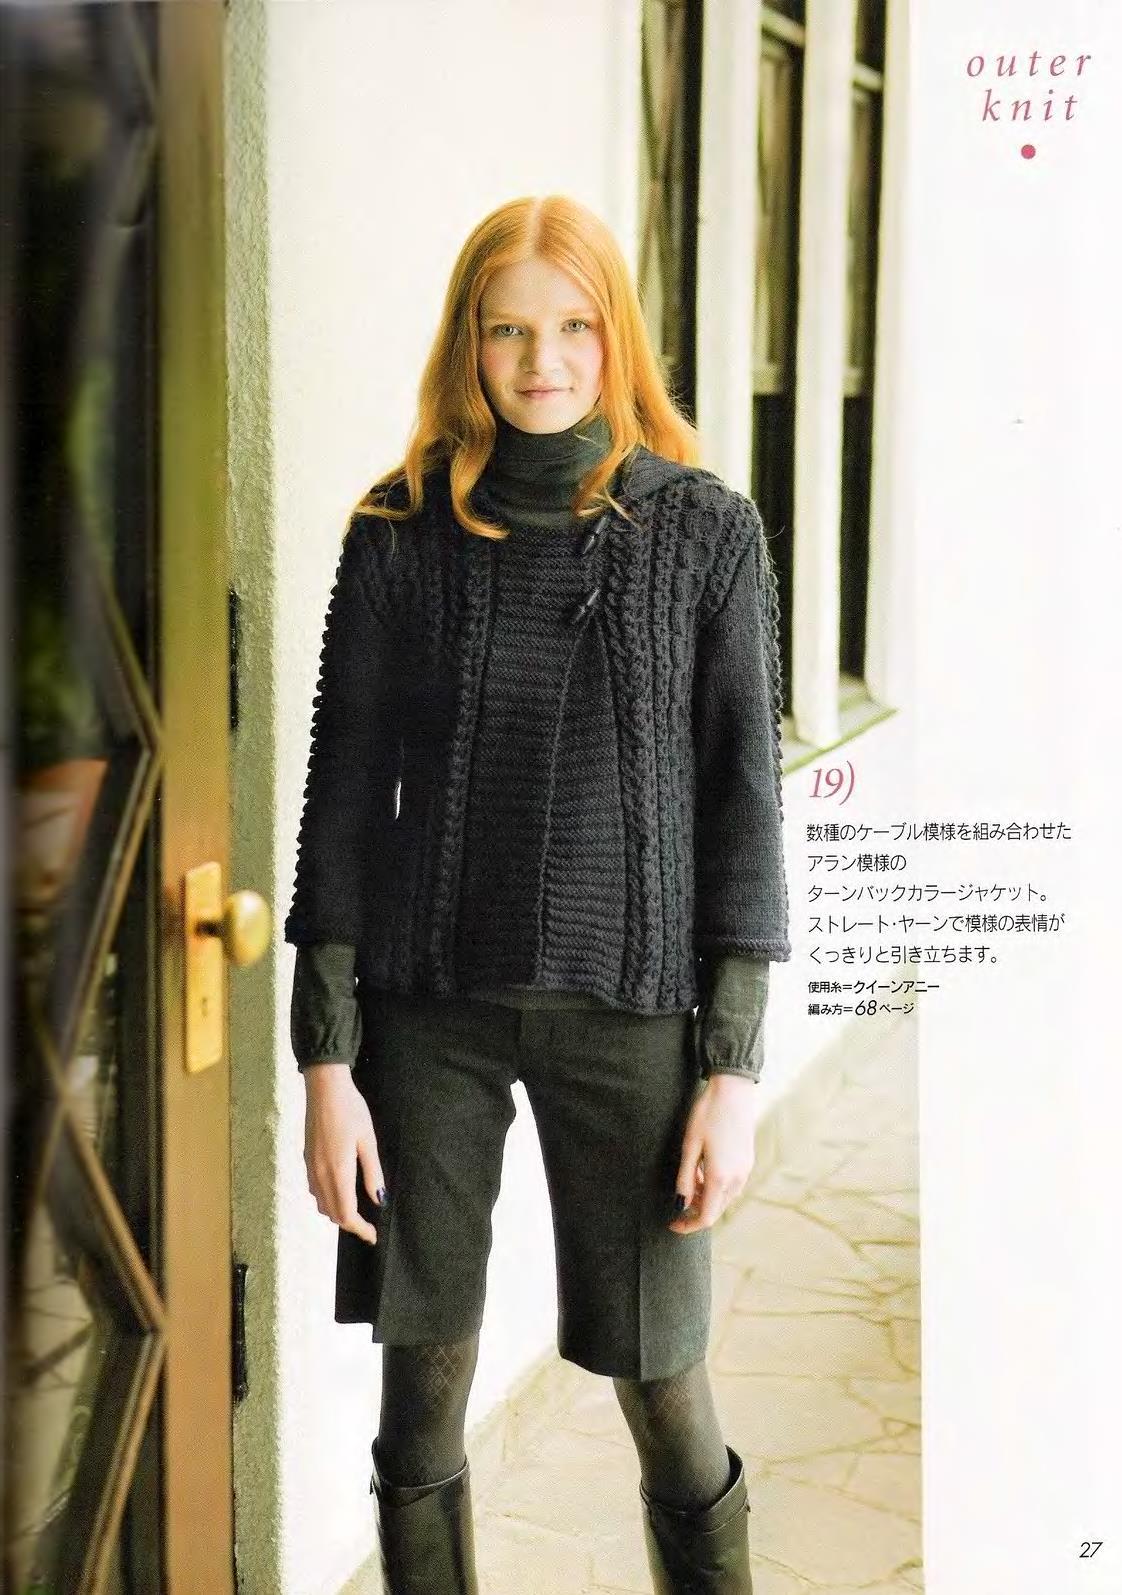 Let's knit series NV4375 2008 M-L sp-kr_27